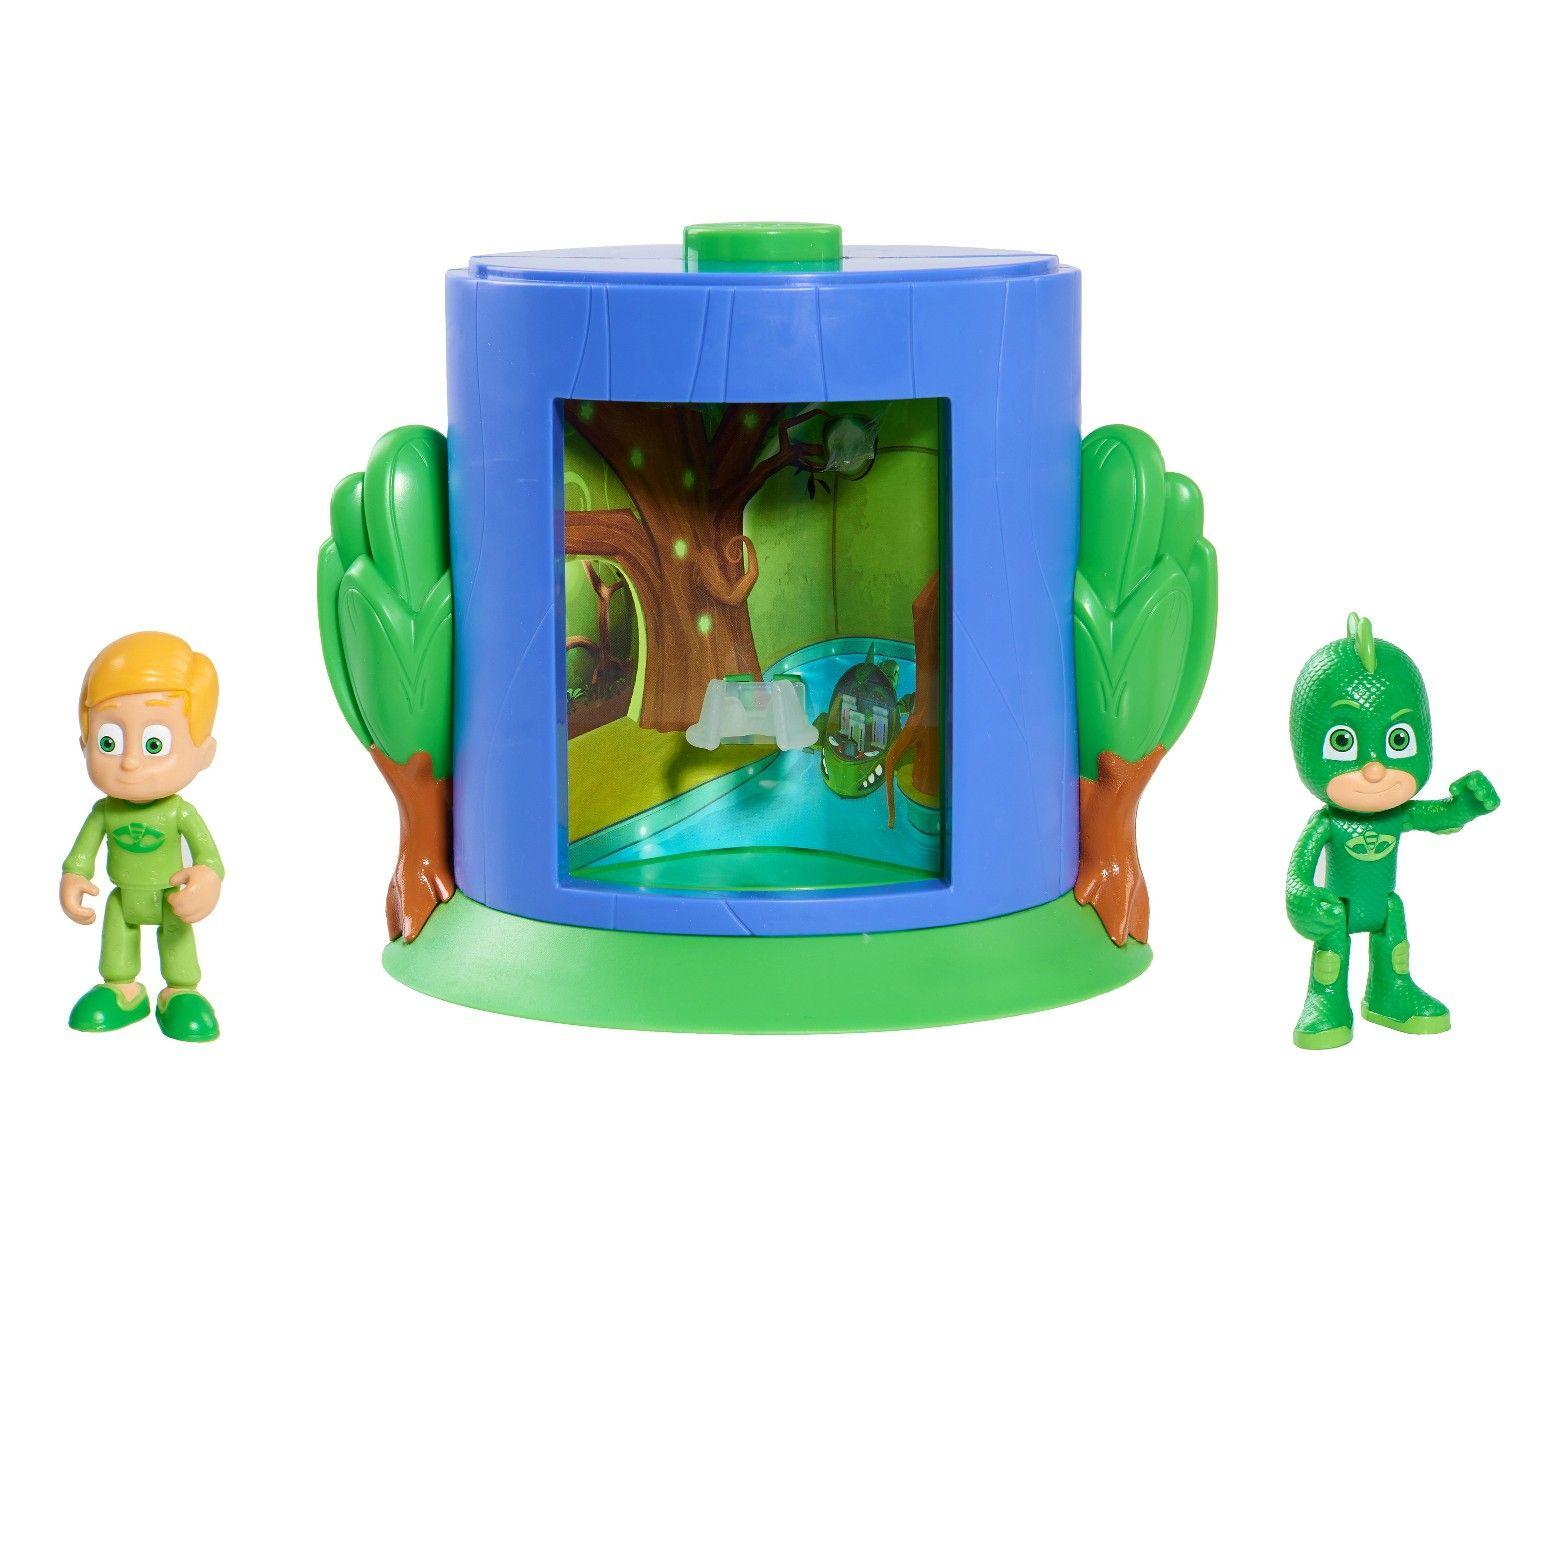 Pj masks transforming figure set gekko pj masks toys